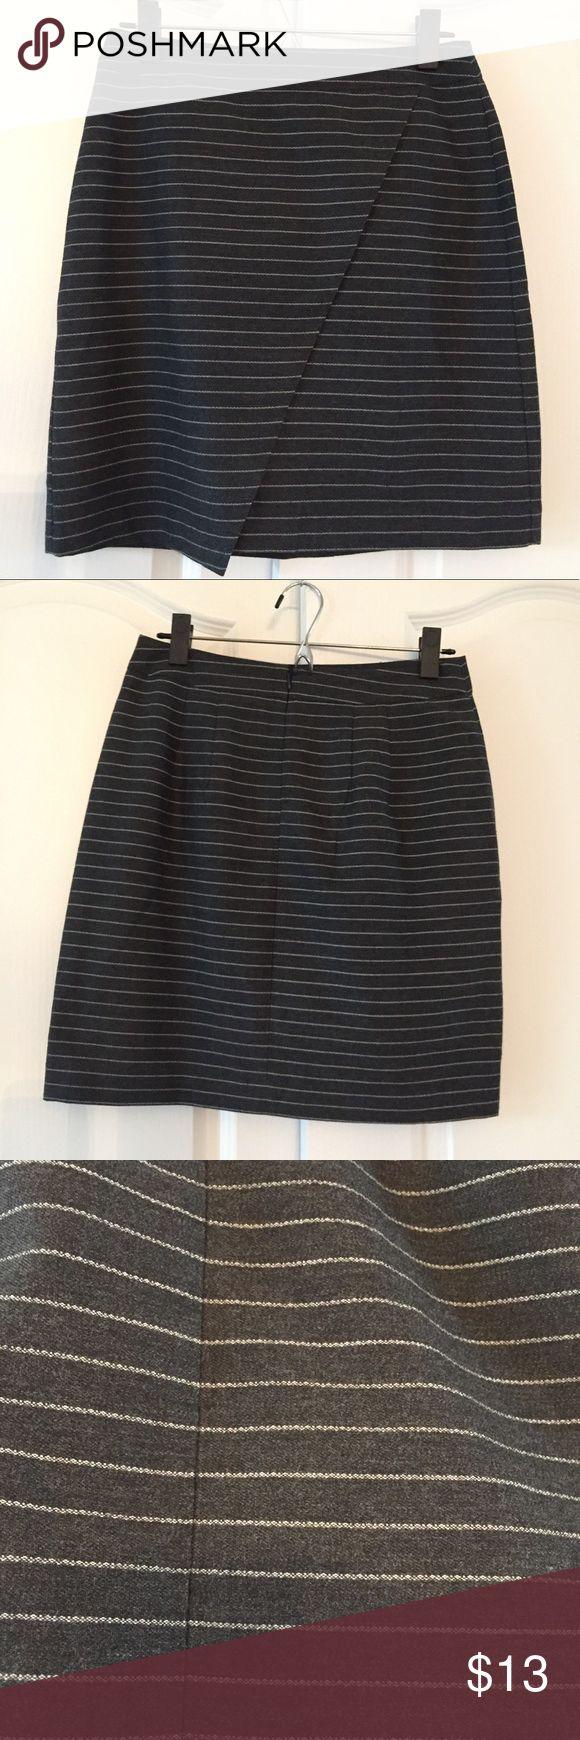 Ann Taylor LOFT outlet skirt, size 2, NWT NWT Loft Outlet work skirt LOFT Skirts Mini